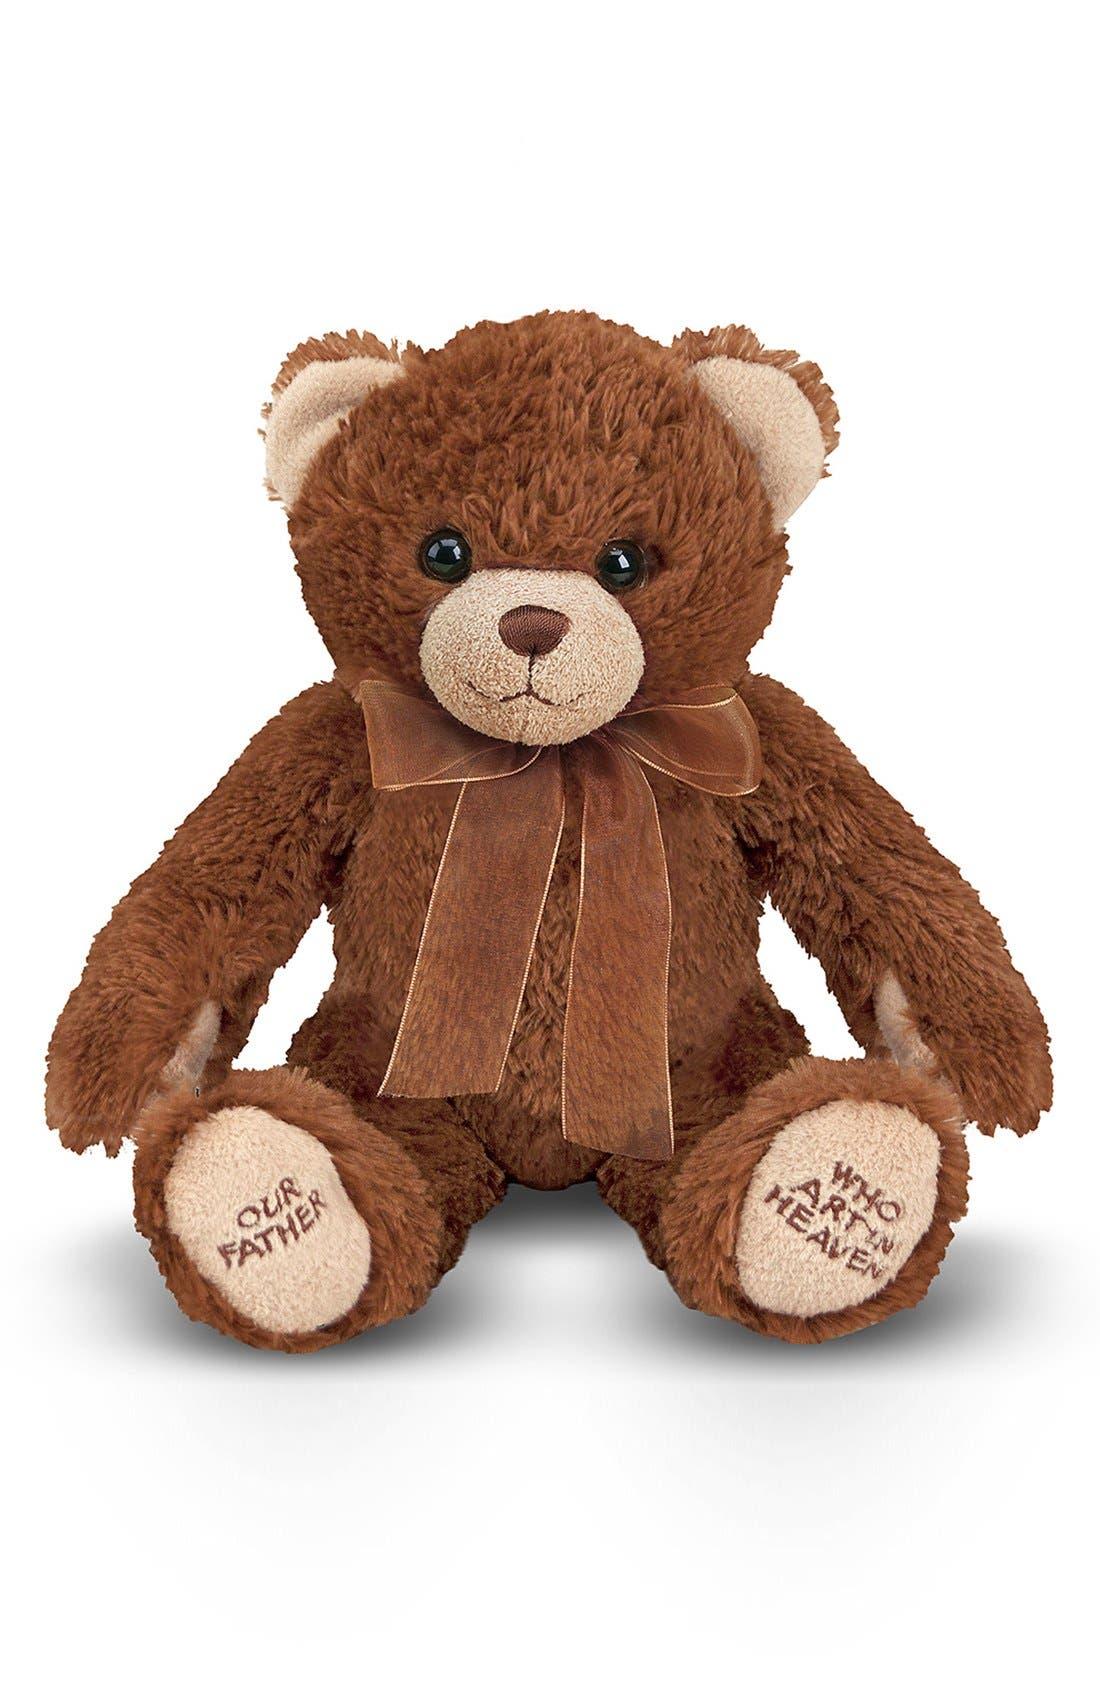 Lord's Prayer Bear Stuffed Animal,                             Main thumbnail 1, color,                             BROWN